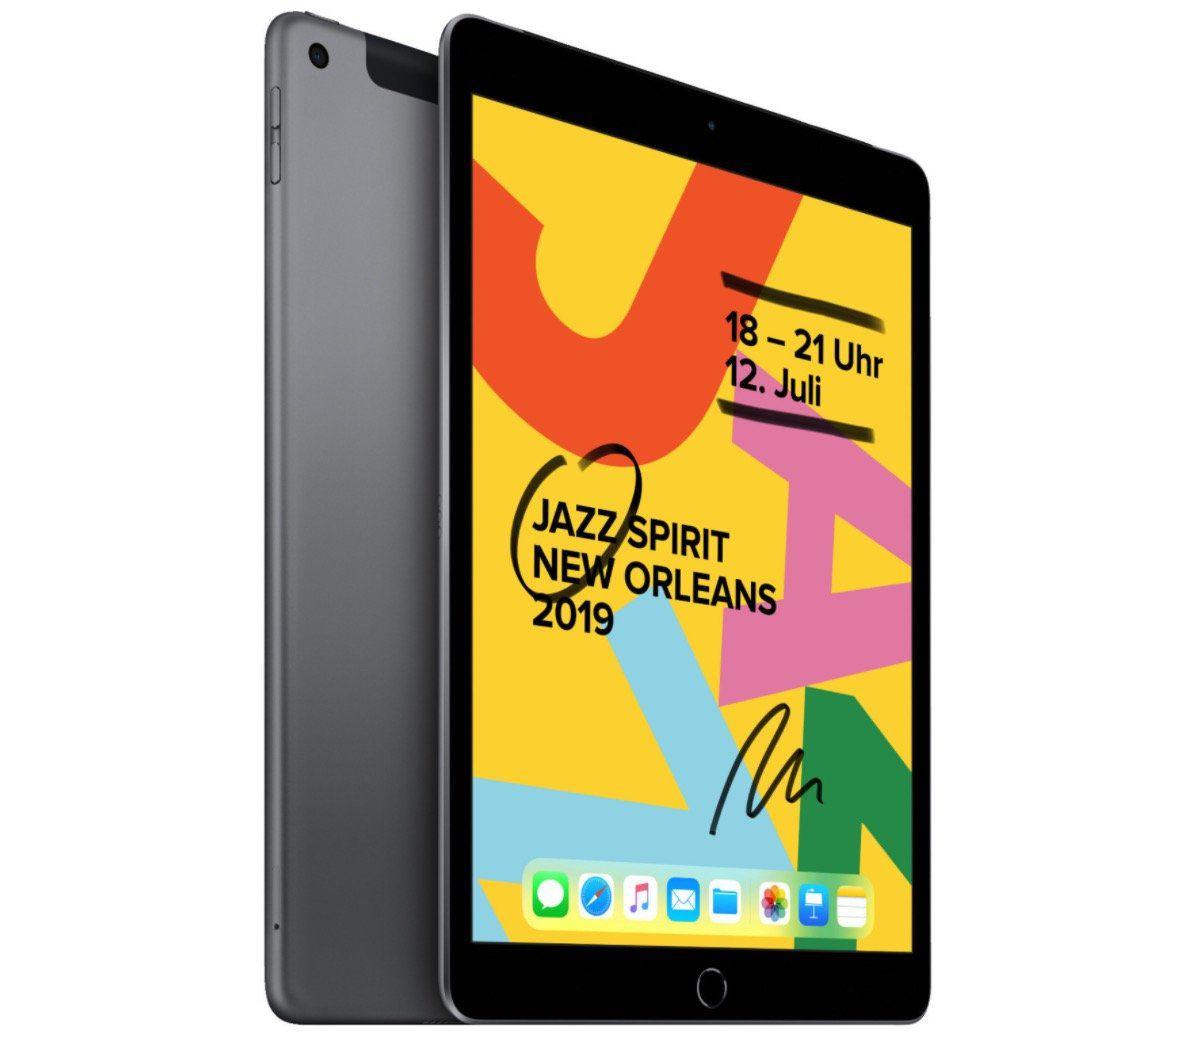 Apple iPad (2019) 128GB WiFi + 4G in Space Grau für 478,25€ (statt 536€)